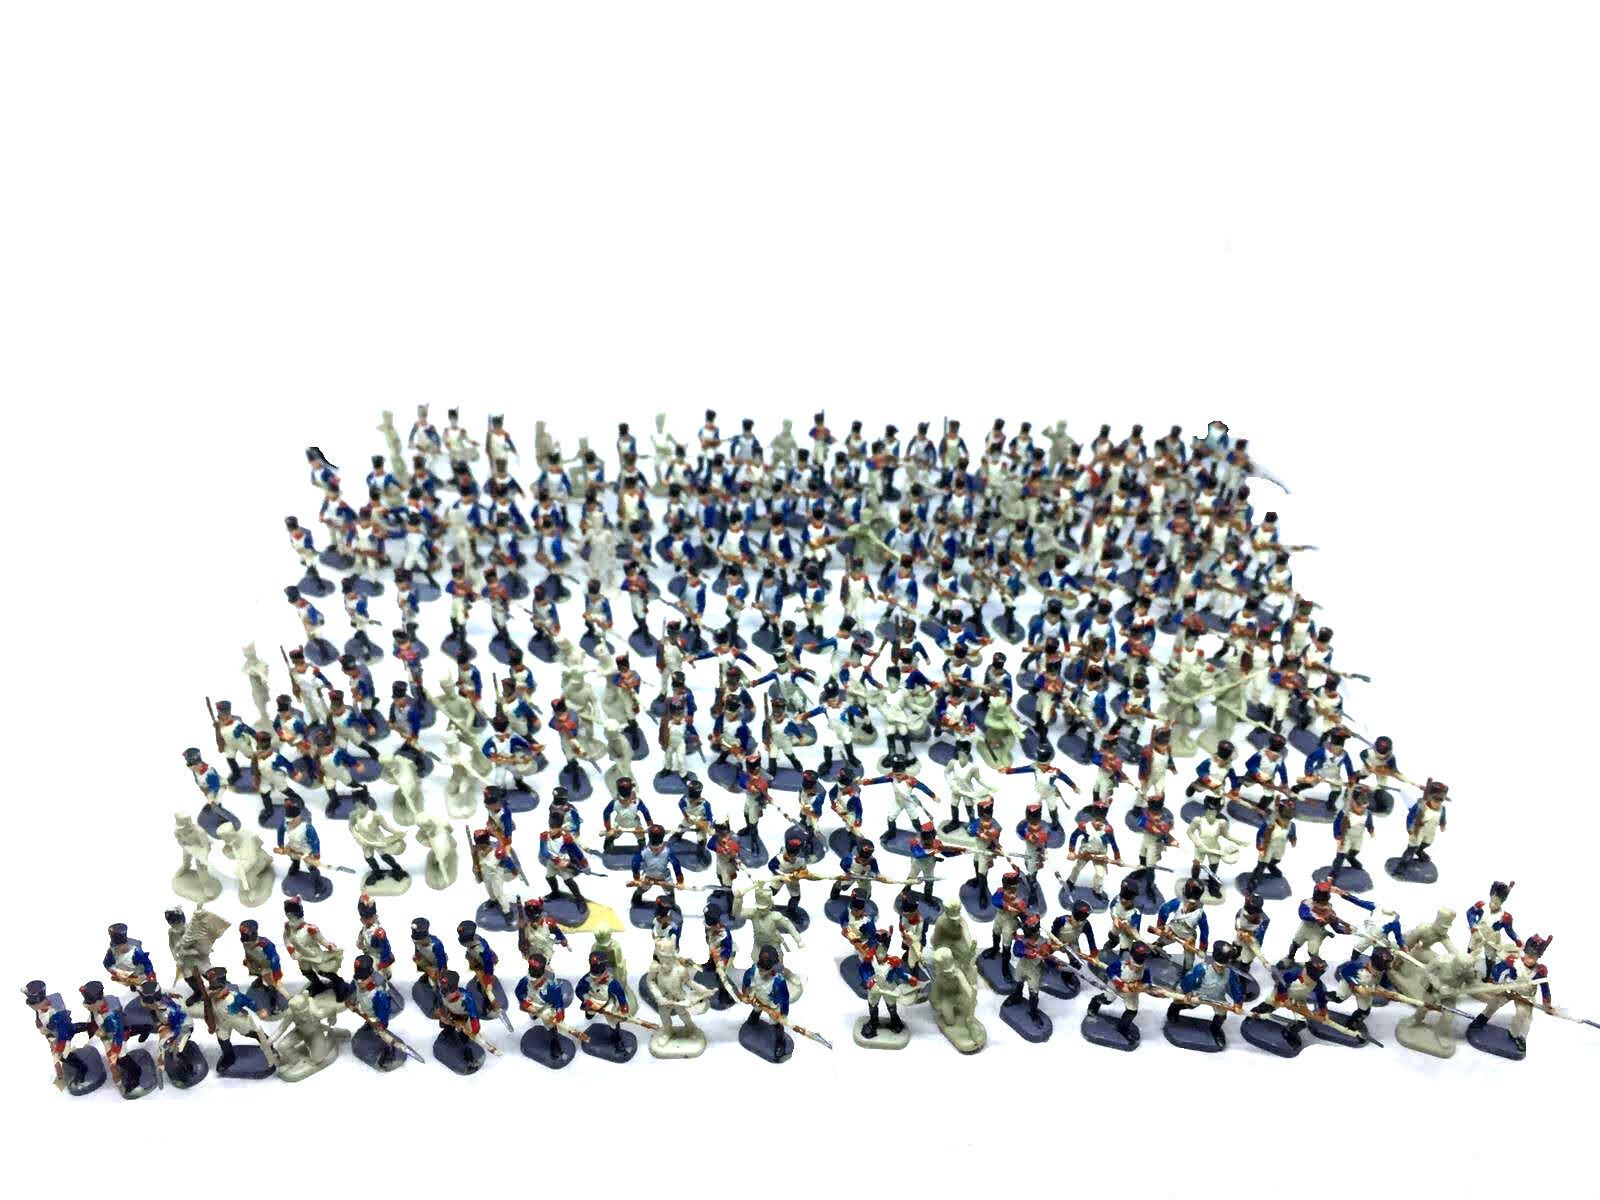 Italeri - French Army (Napoleonic Británico Wars) - 1 72